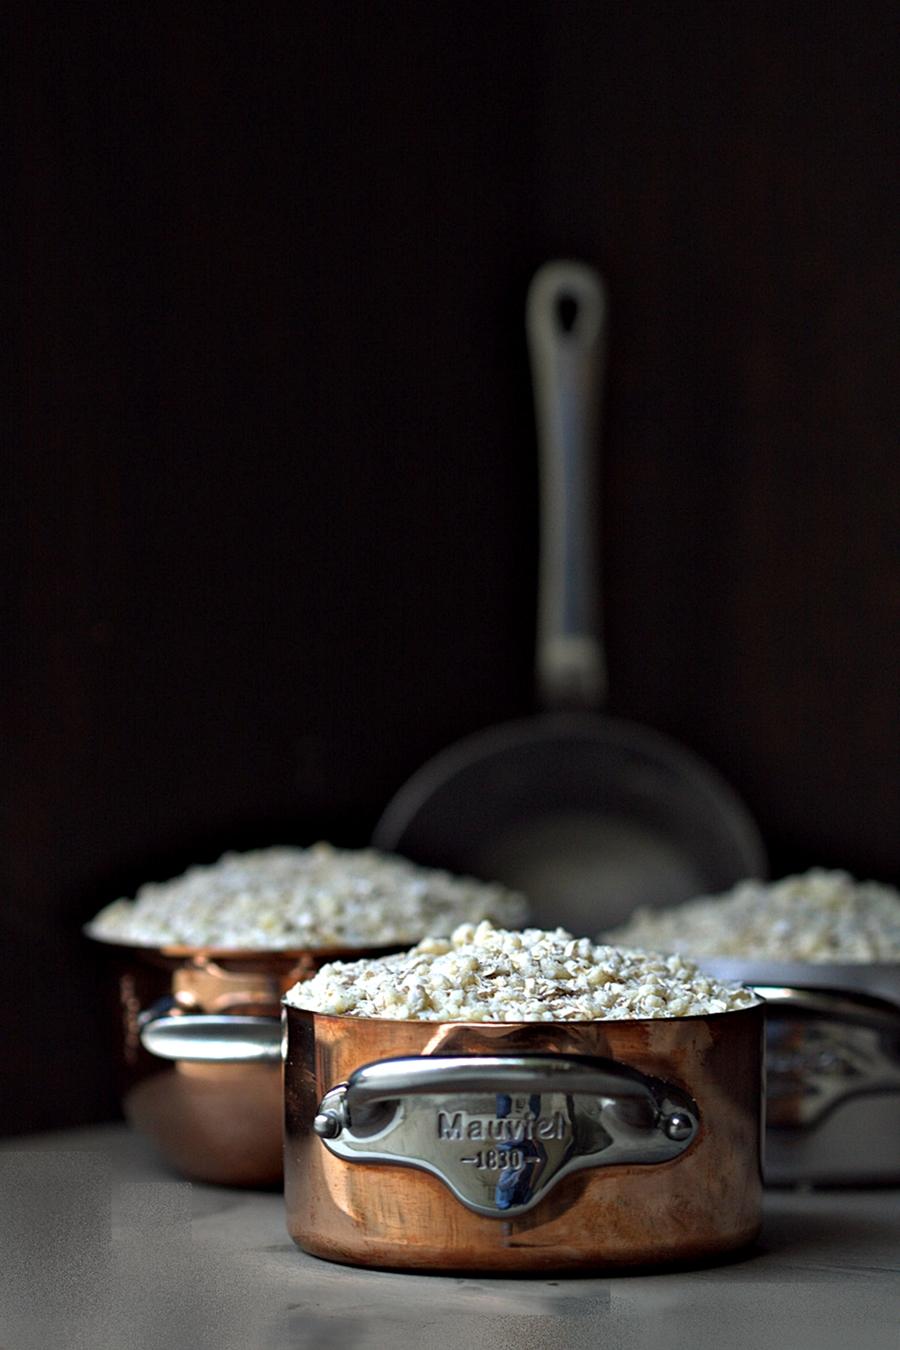 Apple & Pear Crumble in Mauviel1830 copperware